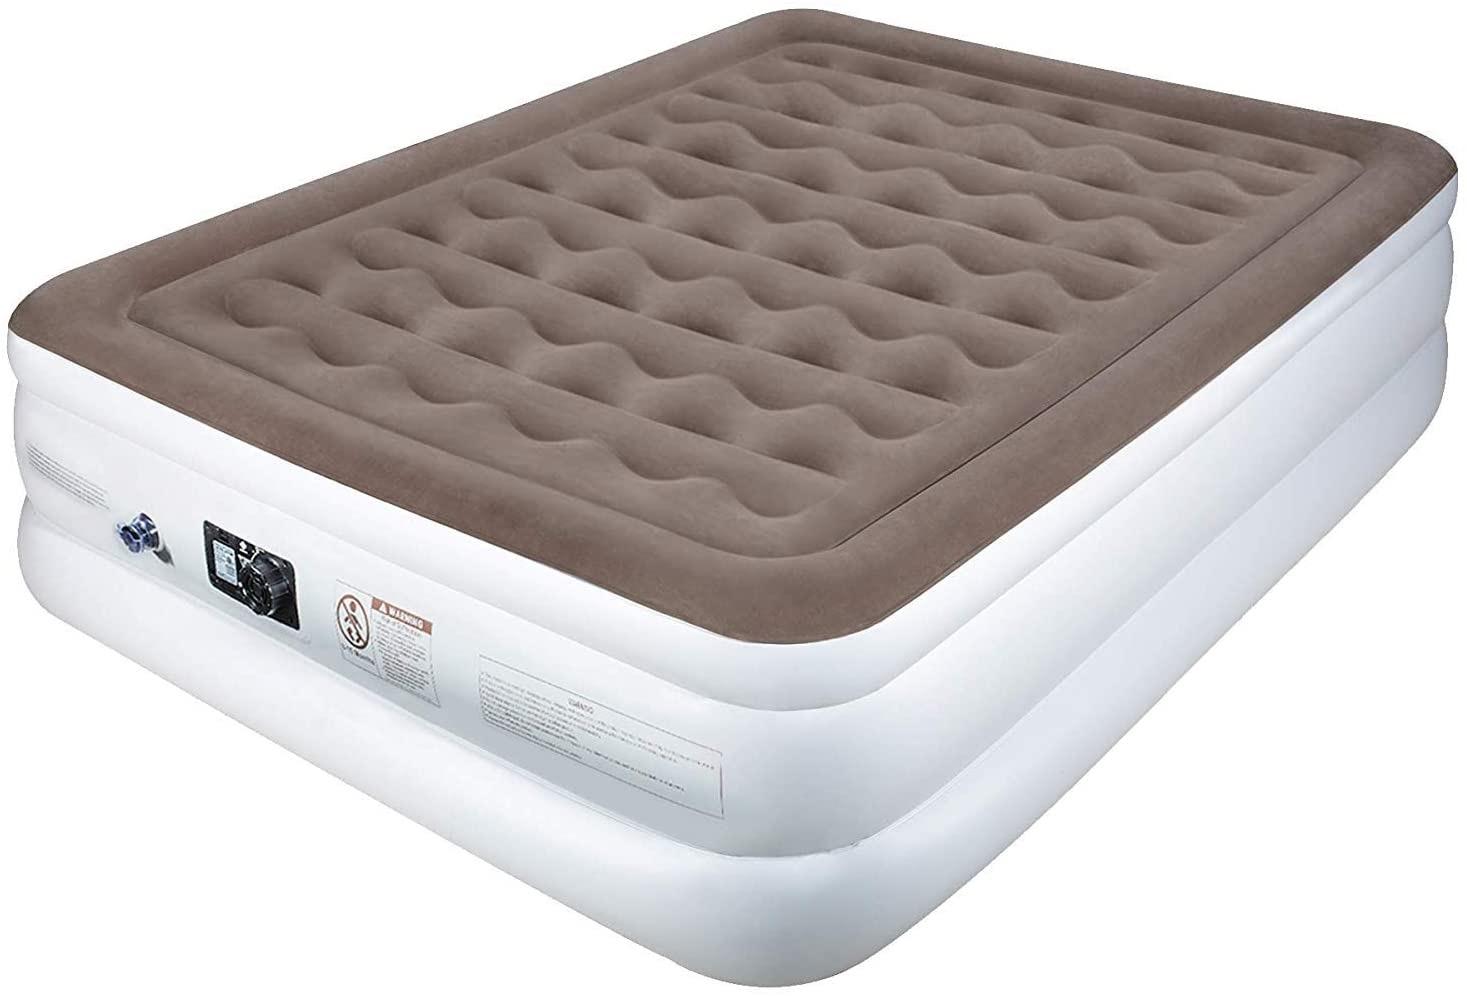 Etekcity mattress